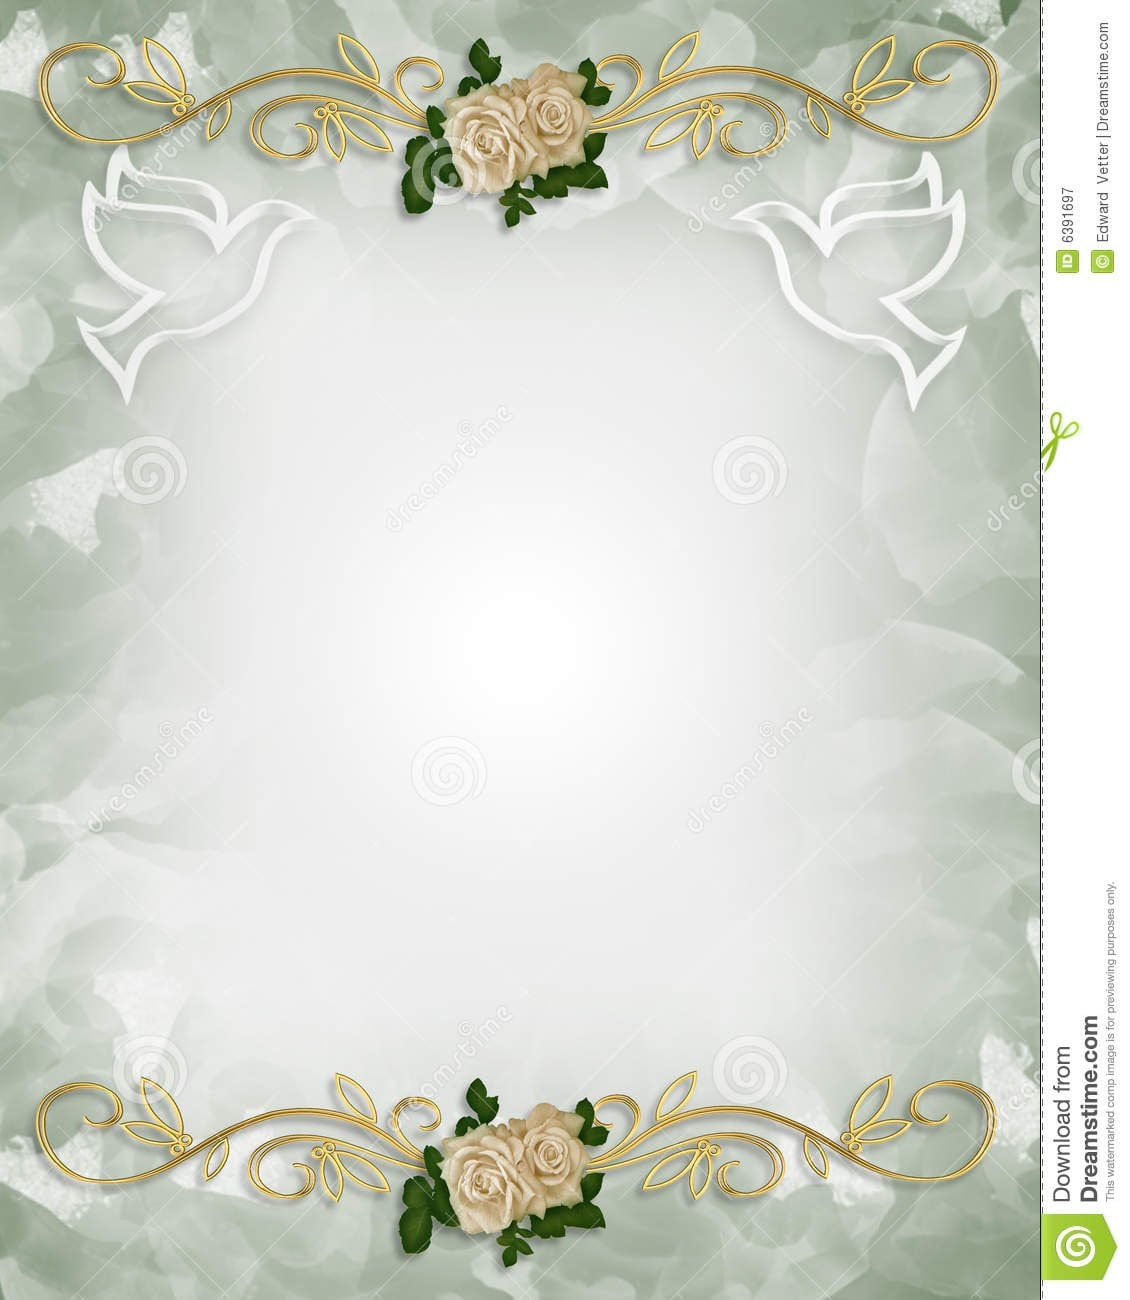 Background Designs For A Wedding  Joy Studio Design